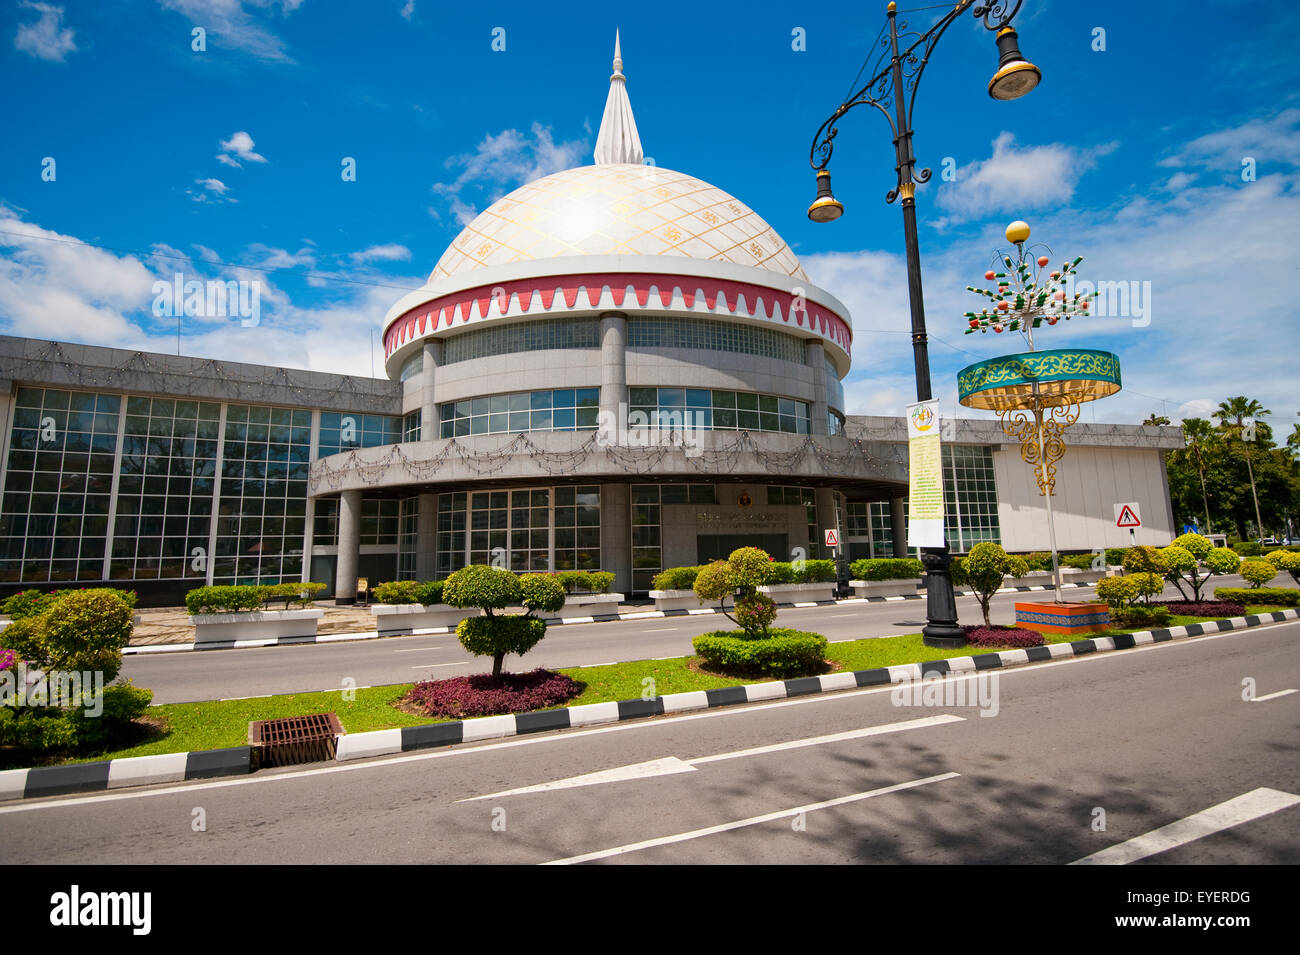 Royal Regalia Museum; Bandar Seri Begawan, Brunei - Stock Image